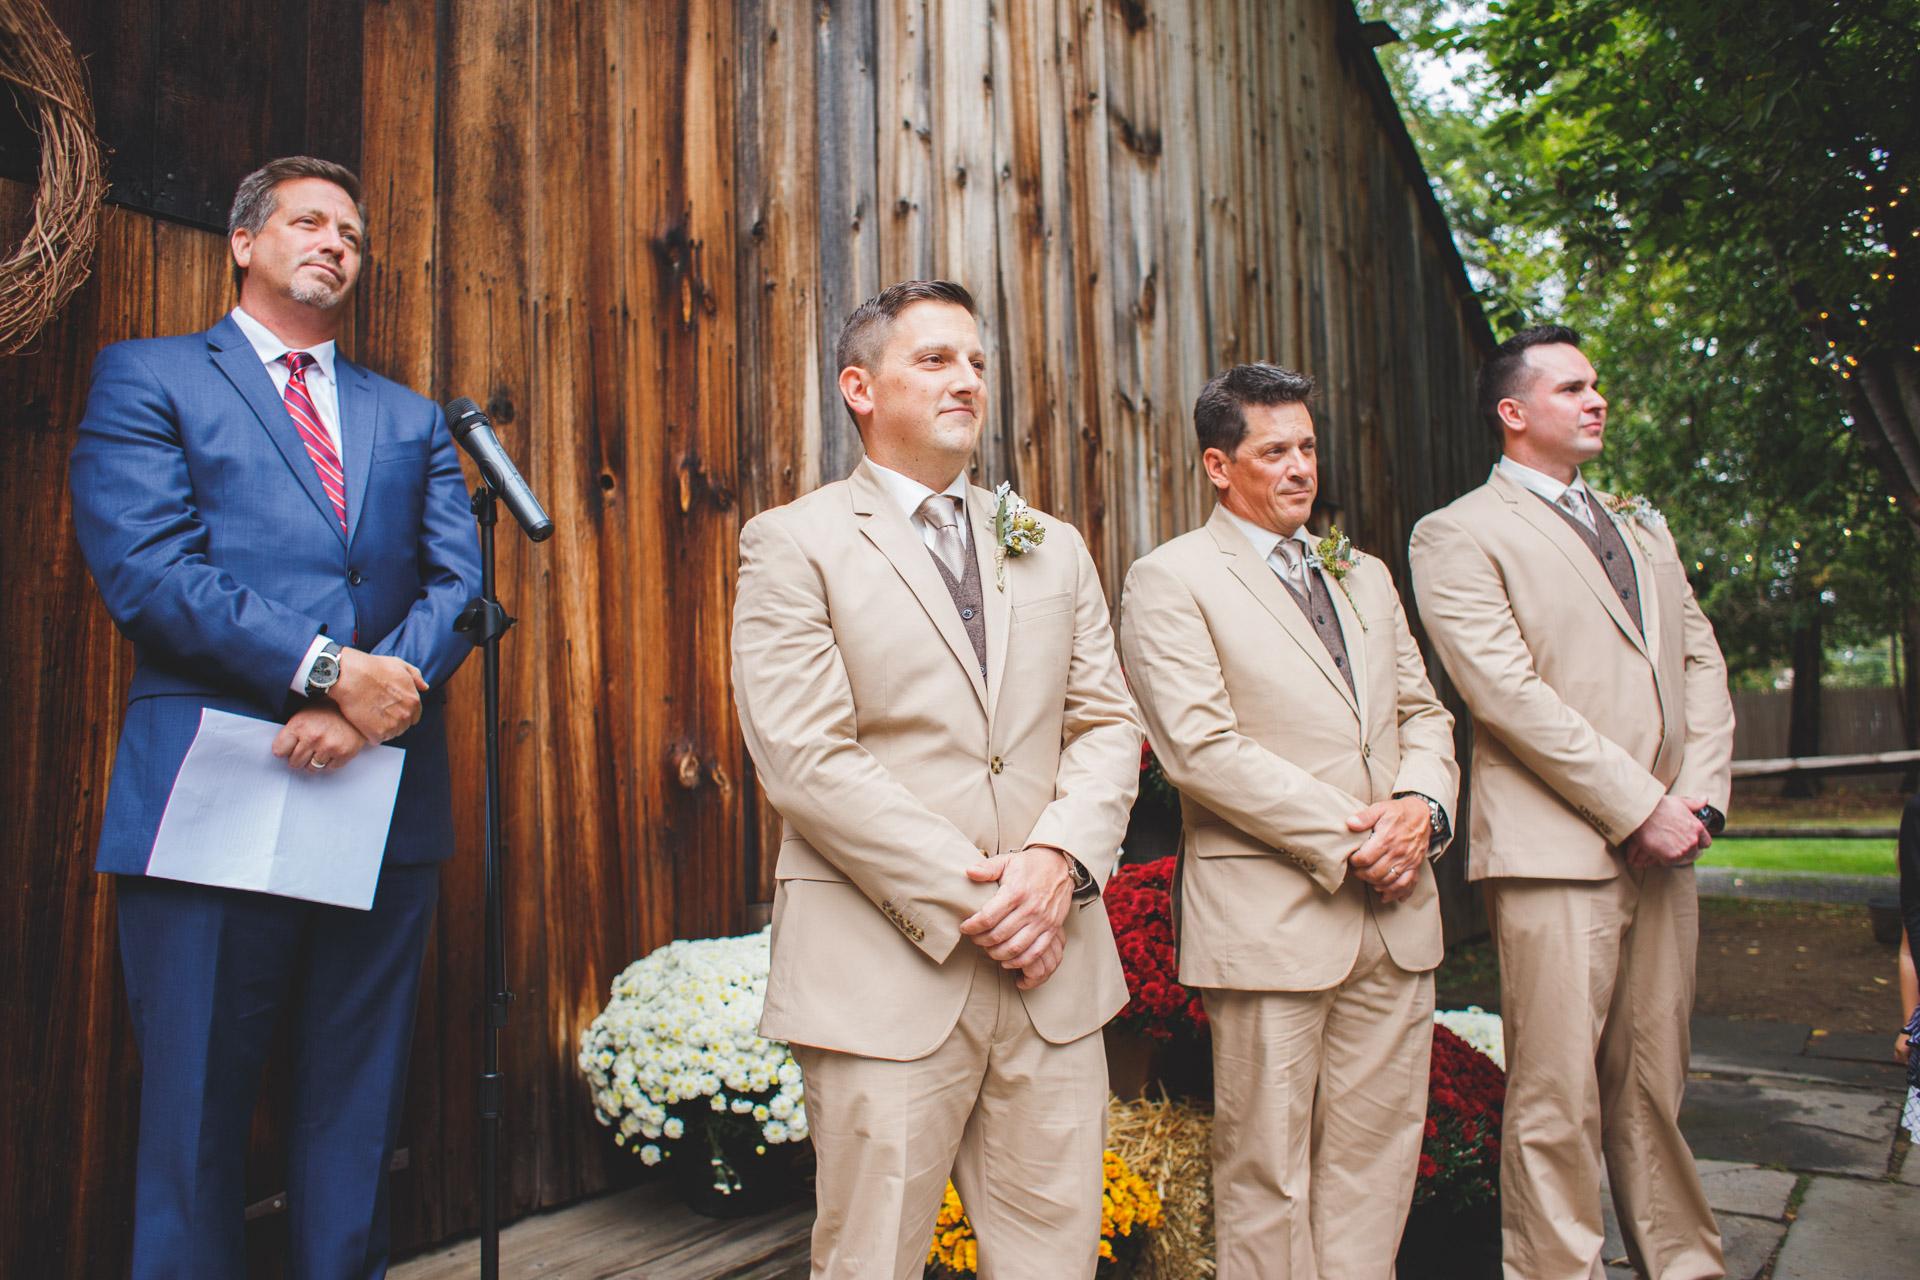 Wedding Photos at Webb Barn Wethersfield -16.jpg